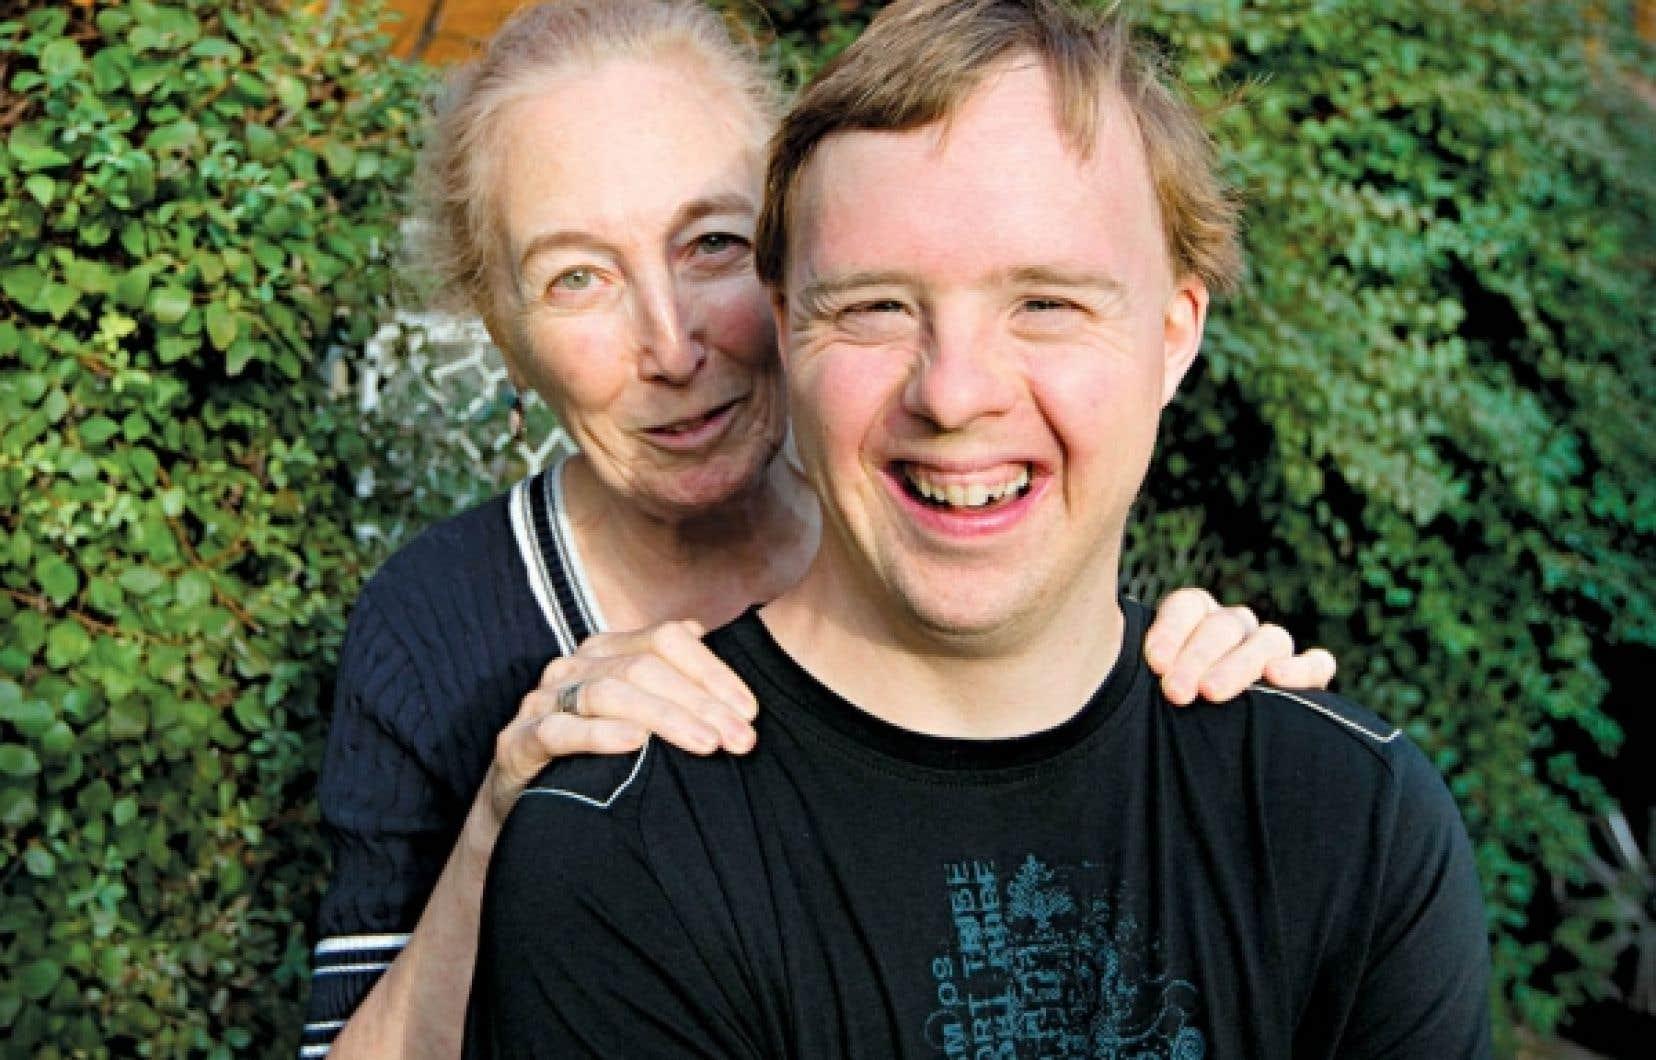 Monique Hennebert et son fils, Carl Hennebert-Faulkner, maintenant âgé de 35 ans.<br />